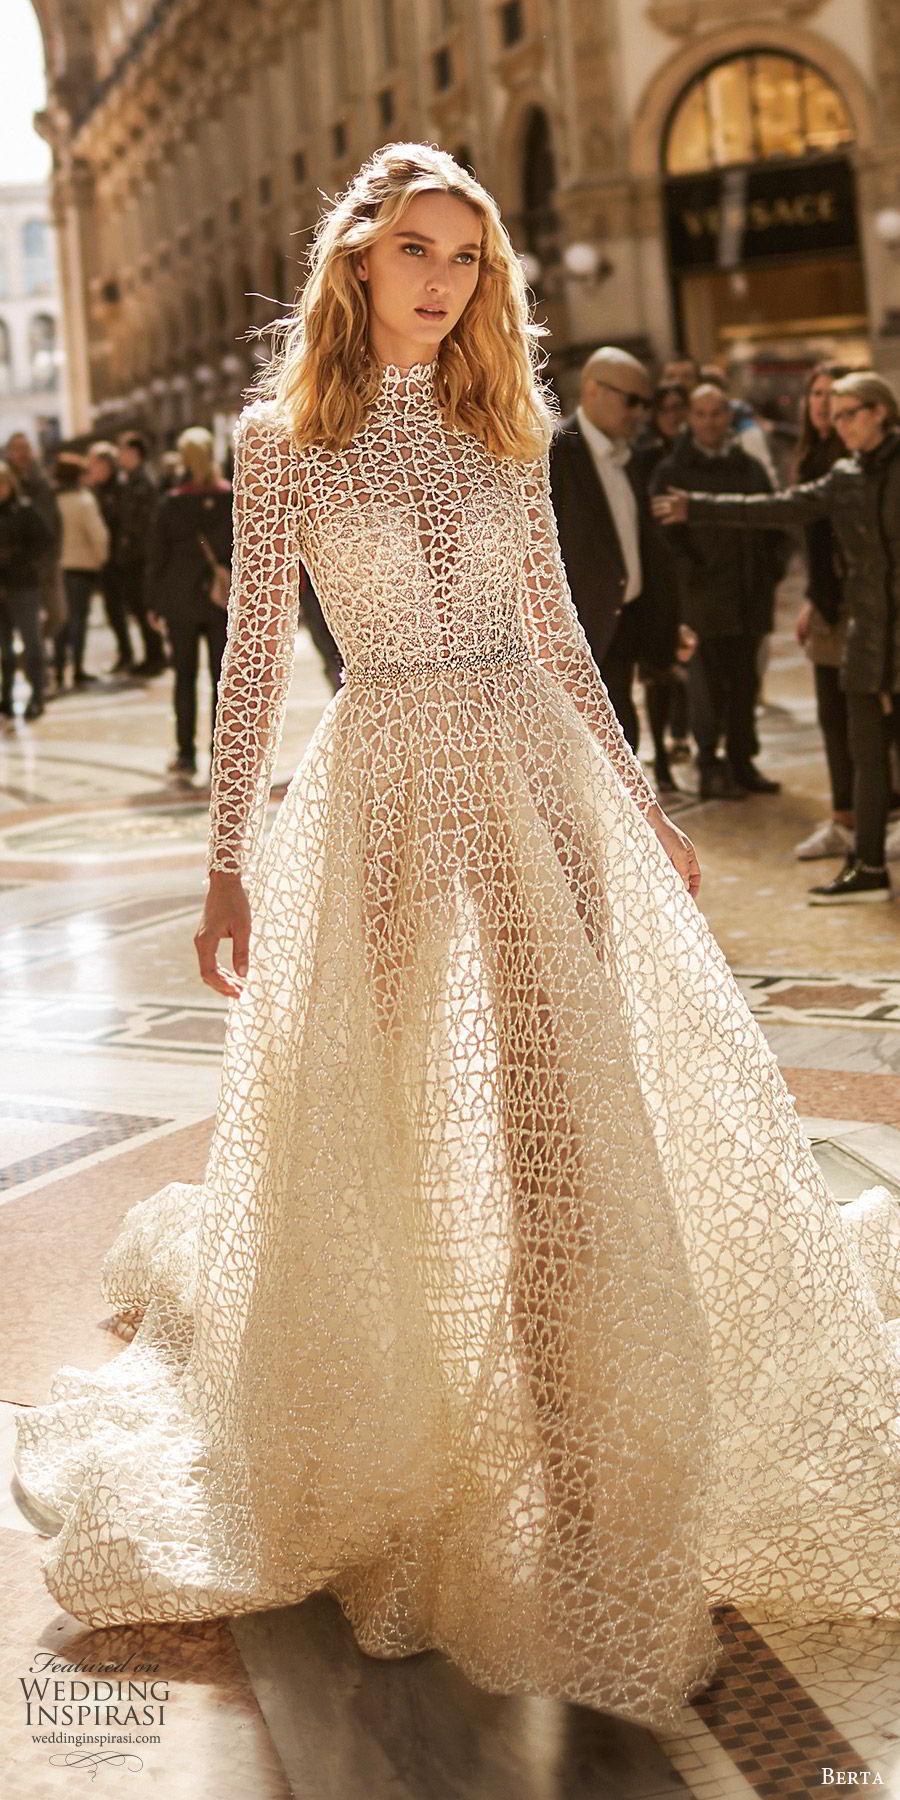 berta spring 2020 bridal illusion long sleeves high neck sheer bodice sweetheart fully embellished ball gown a line wedding dress (4) modern elegant chapel train mv